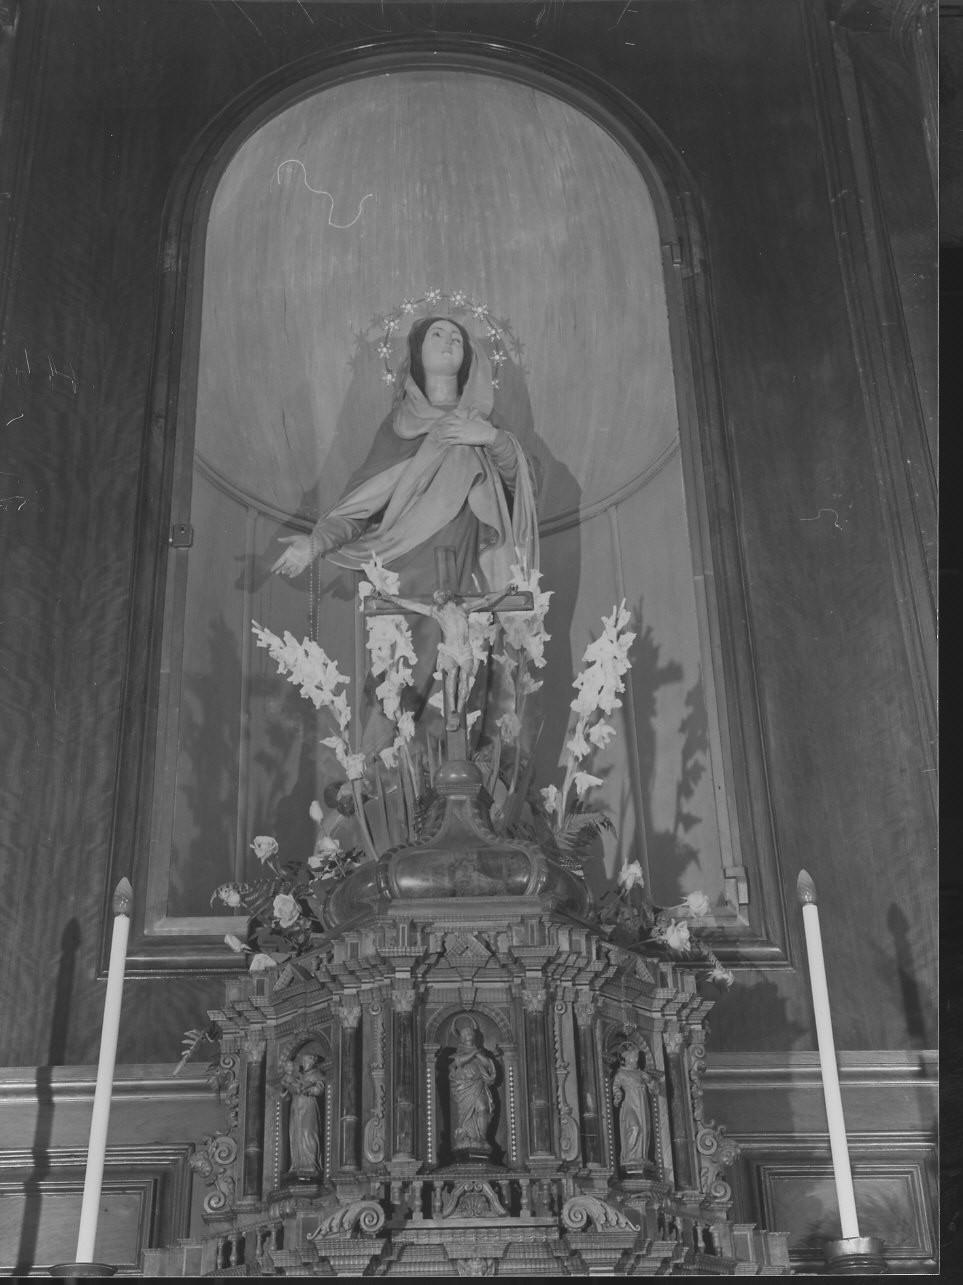 Cristo crocifisso (crocifisso, elemento d'insieme) - bottega ligure (sec. XIX)